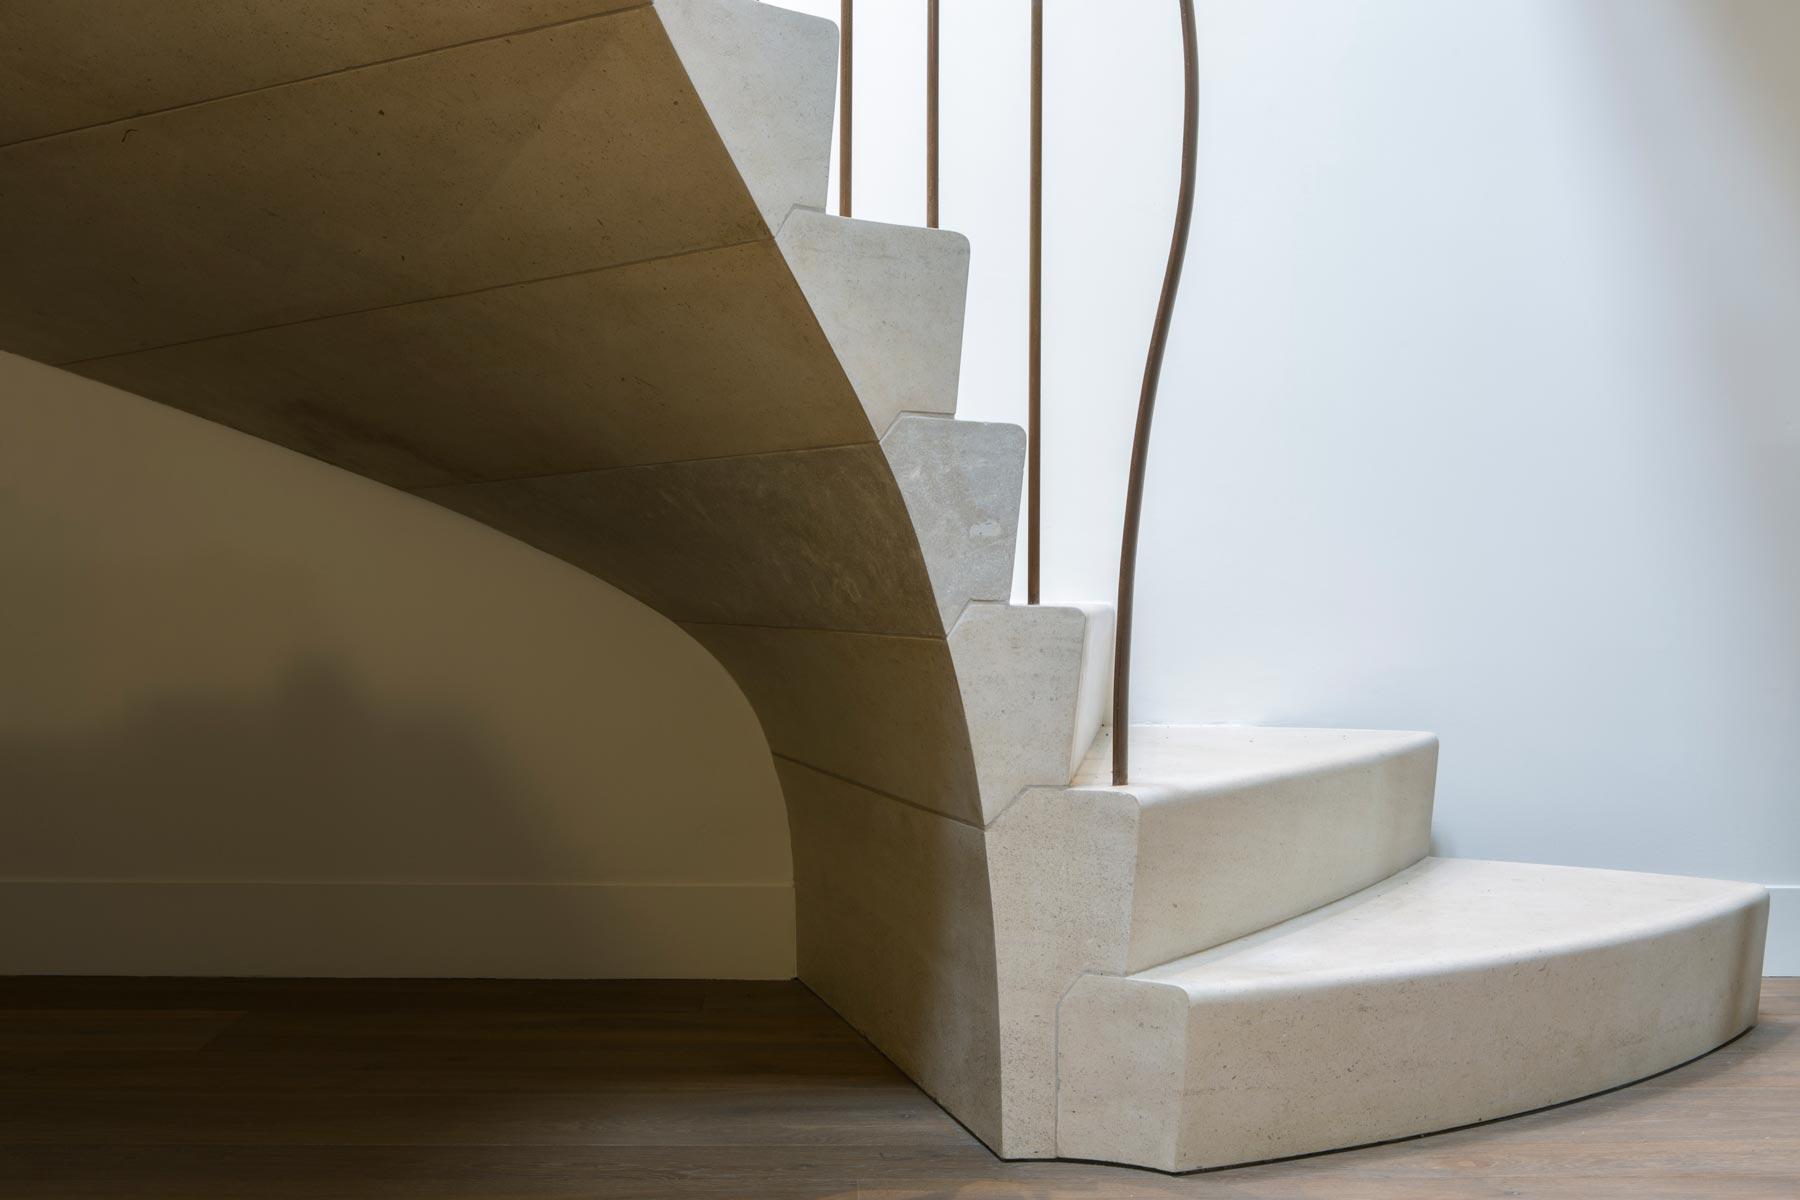 sculptural-limestone-staircase-4-oxfordshire-rogue-designs-ian-knapper.jpg